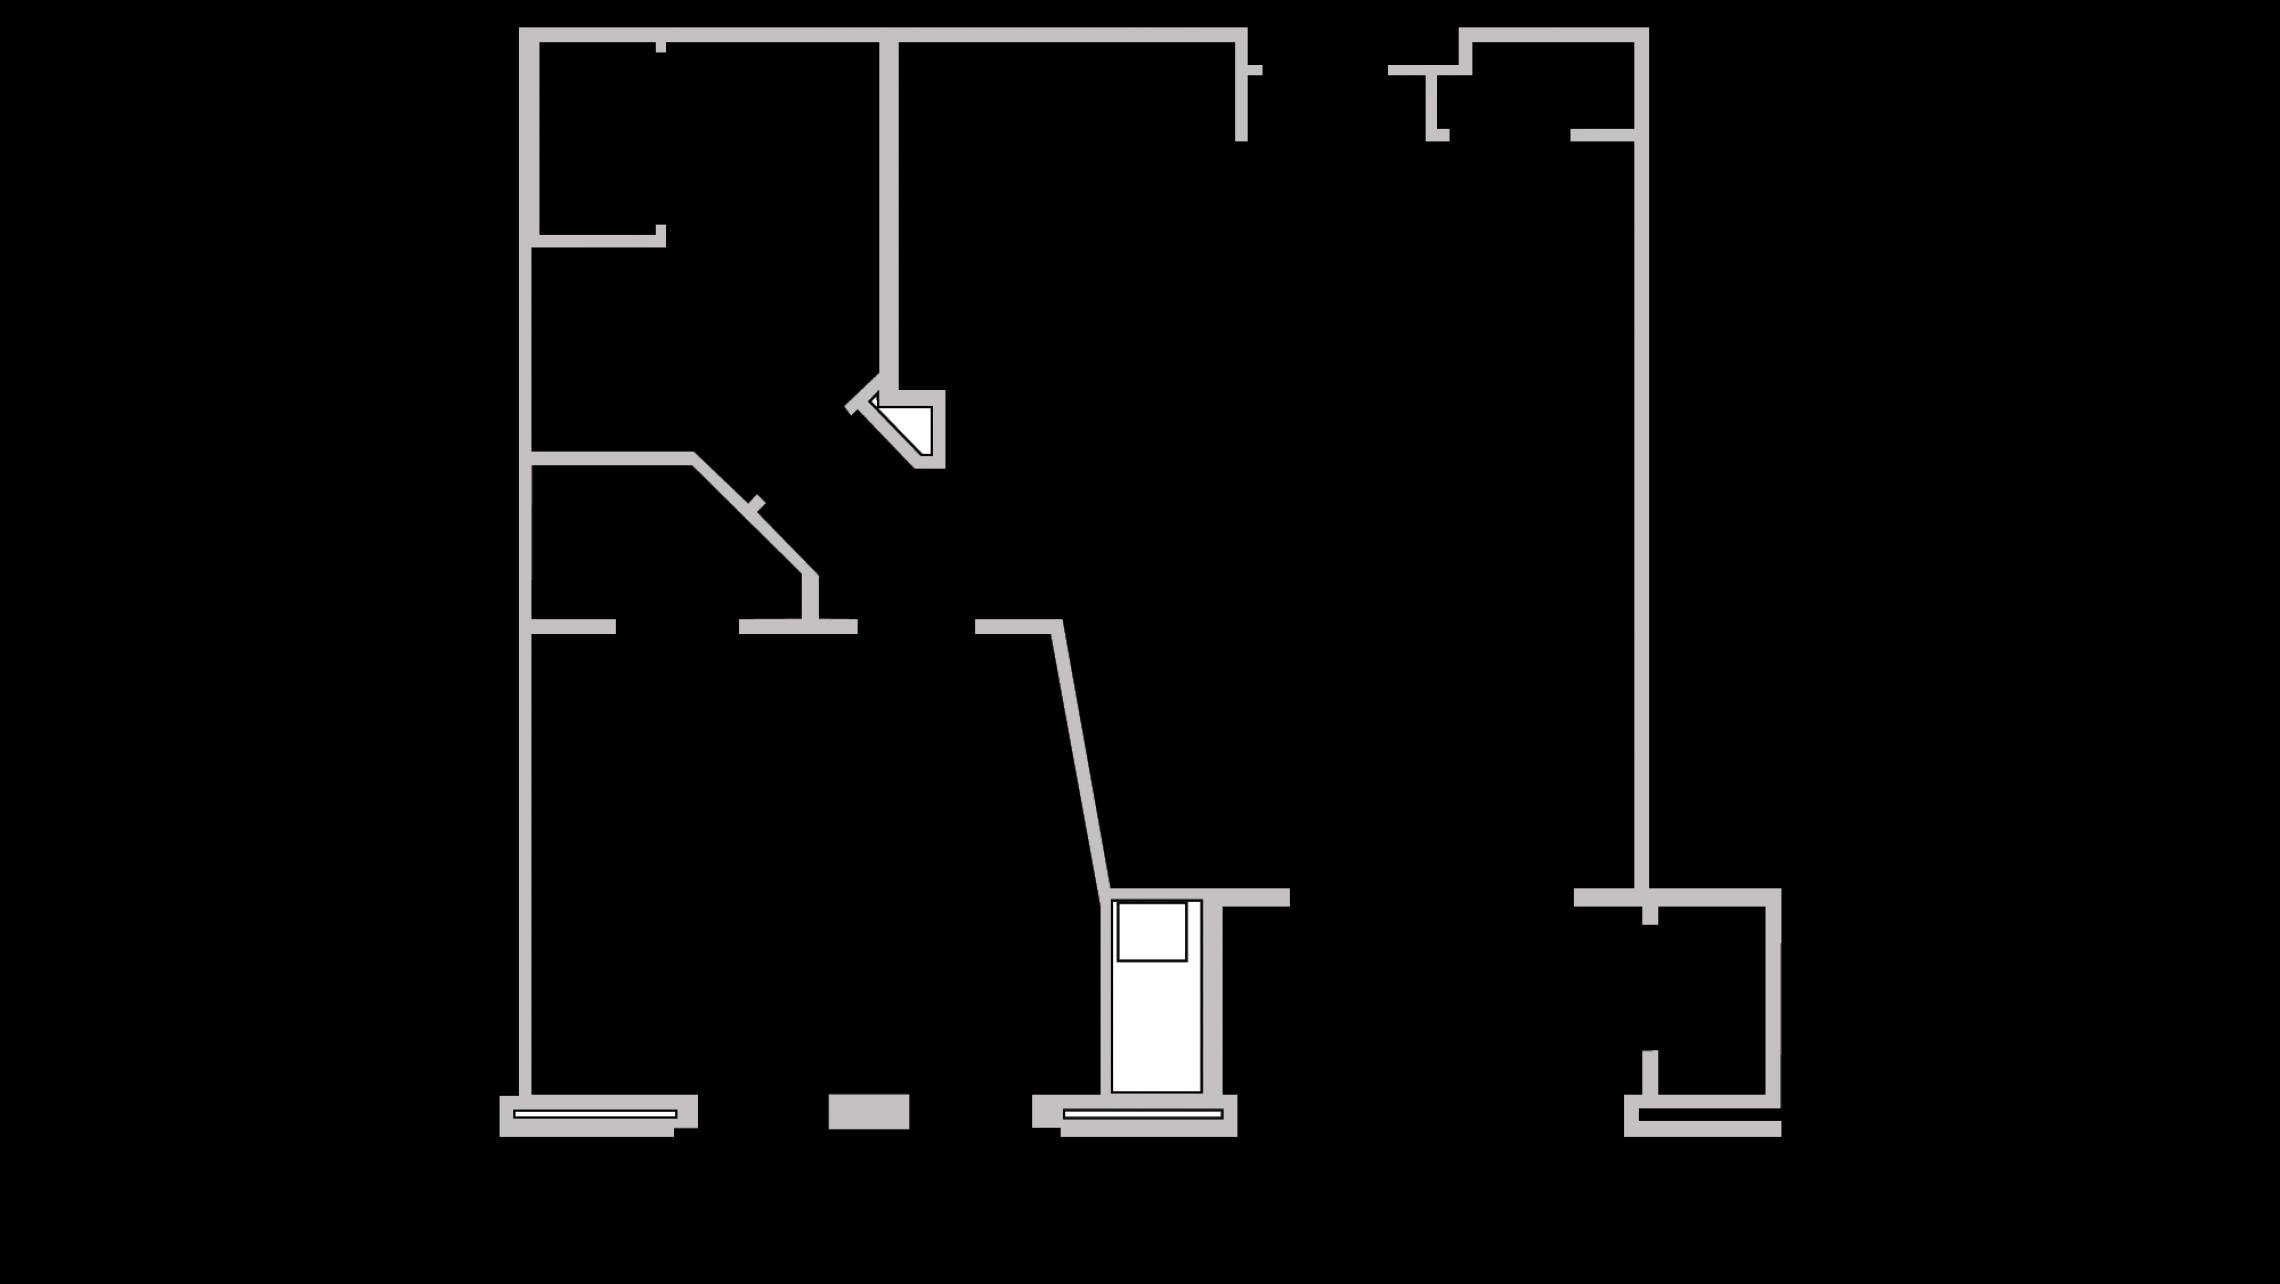 ULI The Depot 2-204 - One Bedroom, One Bathroom